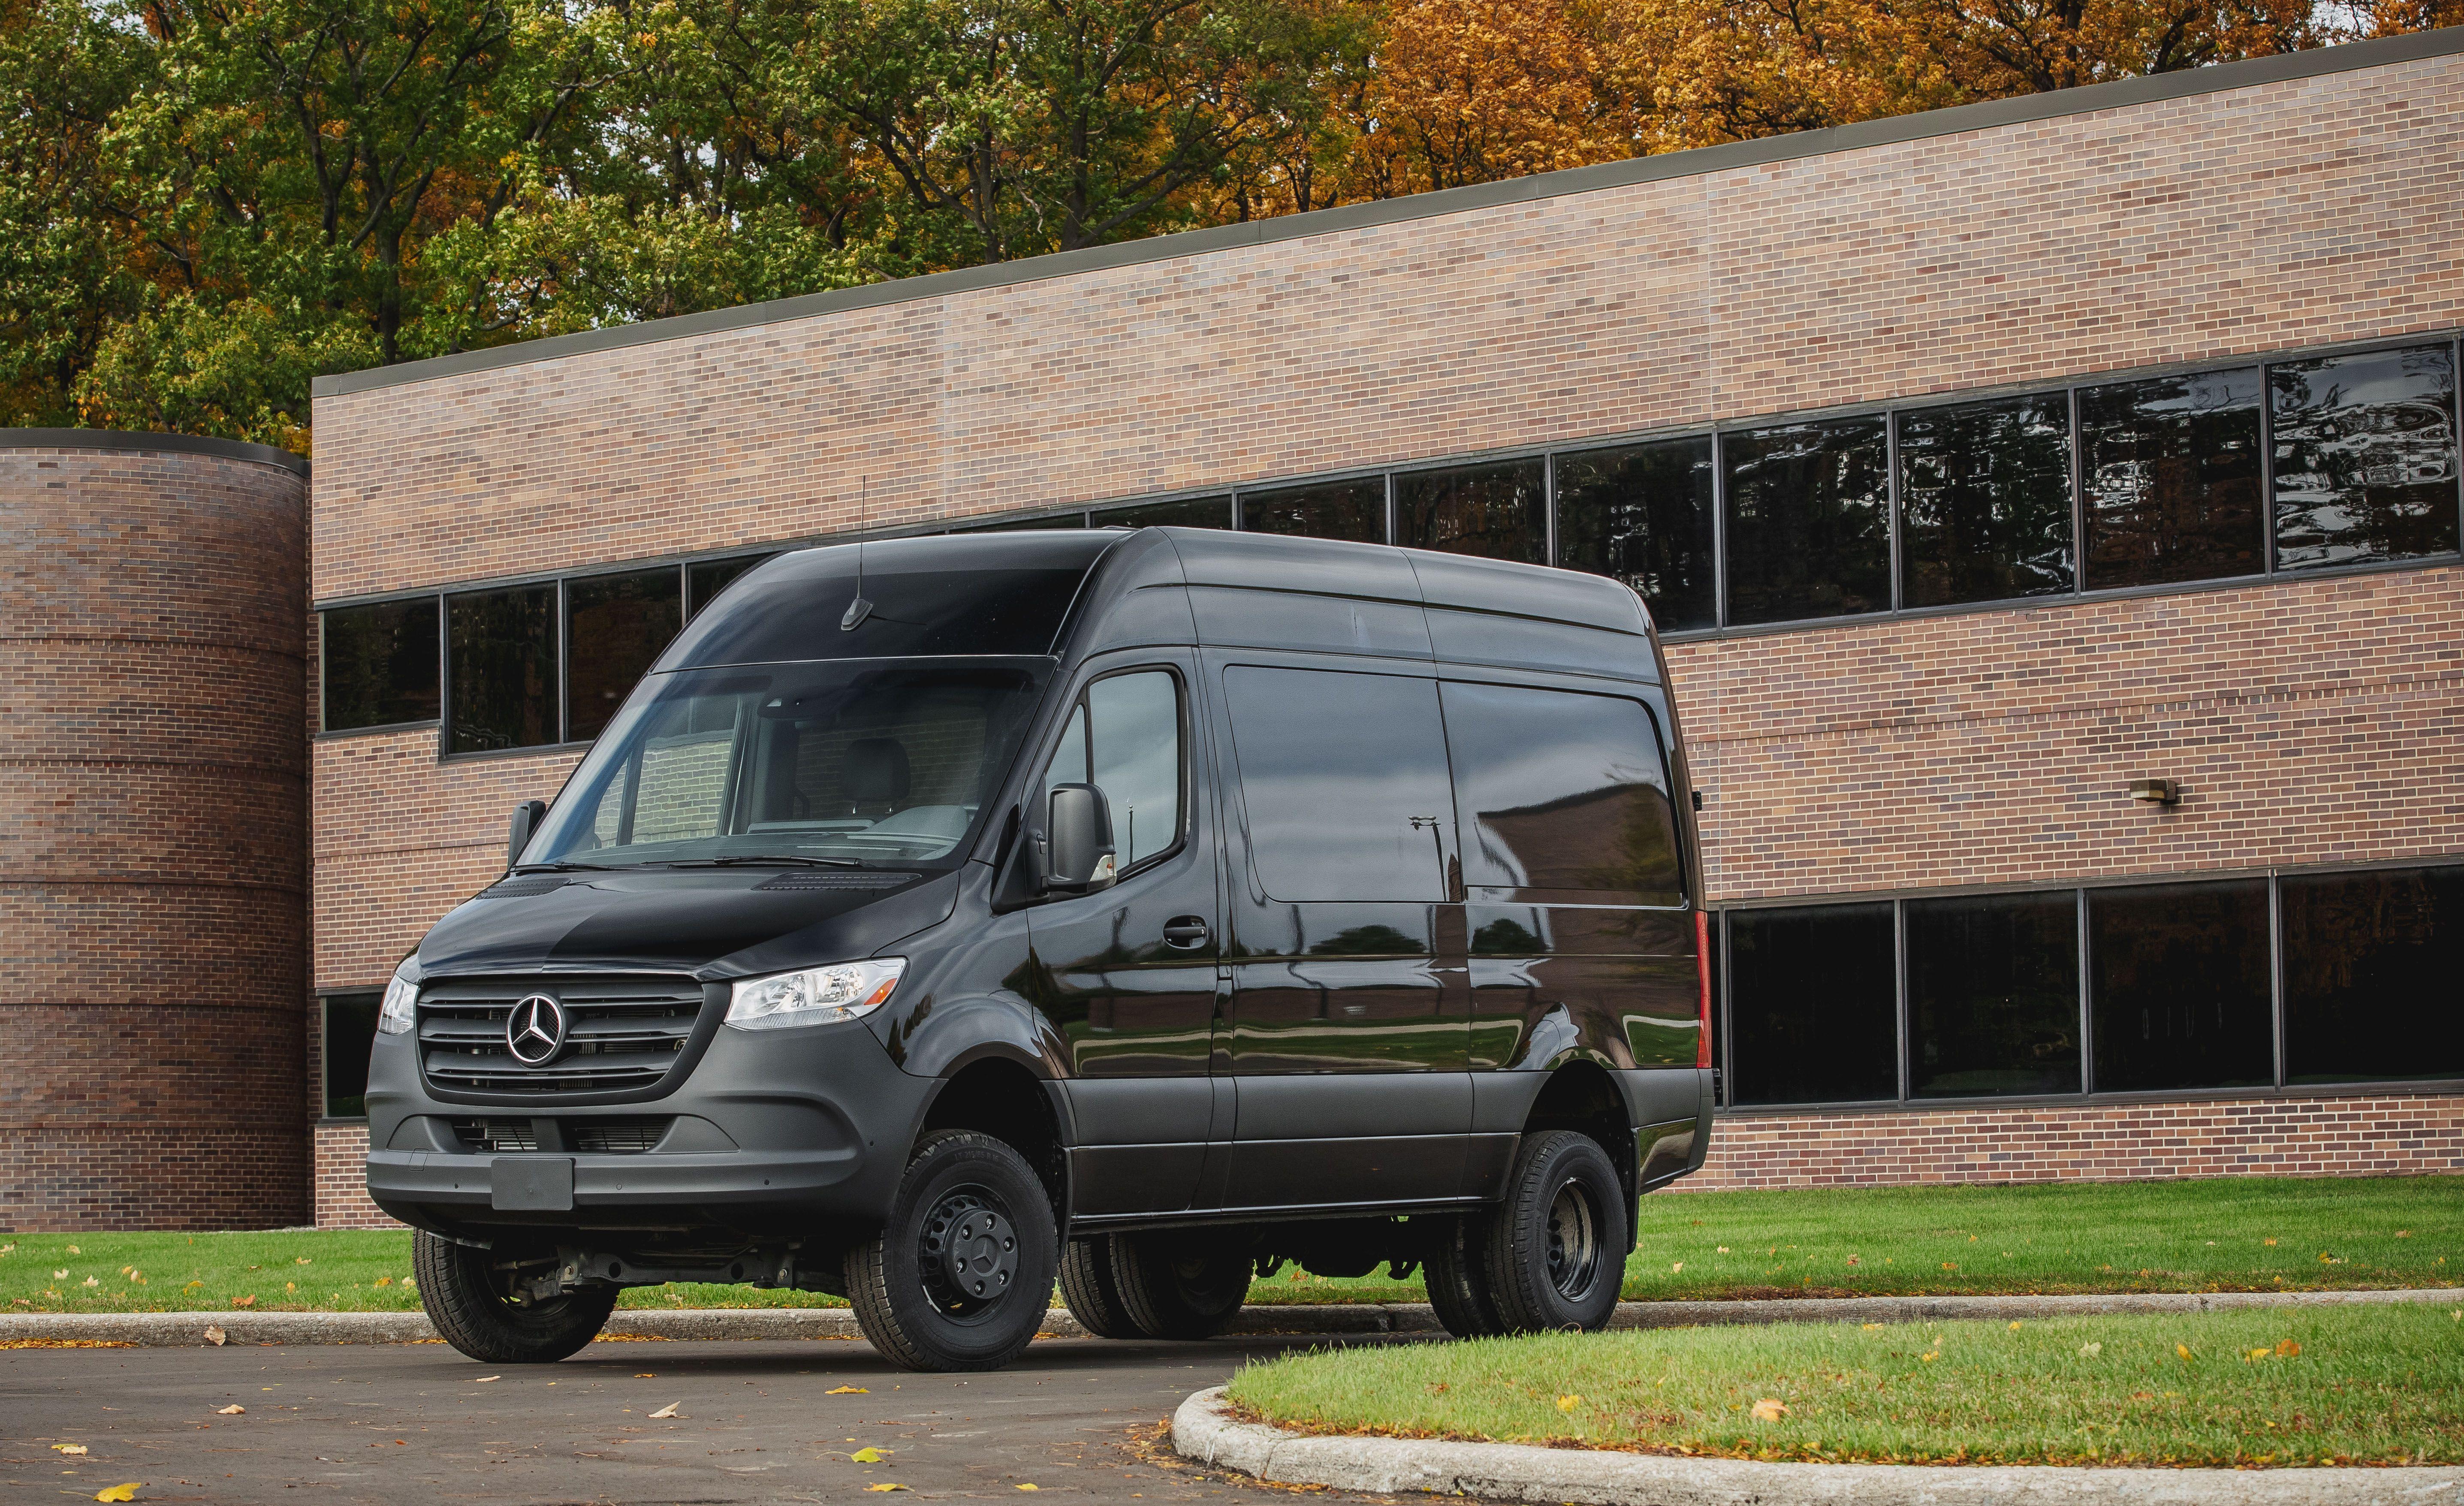 2019 Mercedes Benz Sprinter Goes Big With A High Tech Redesign